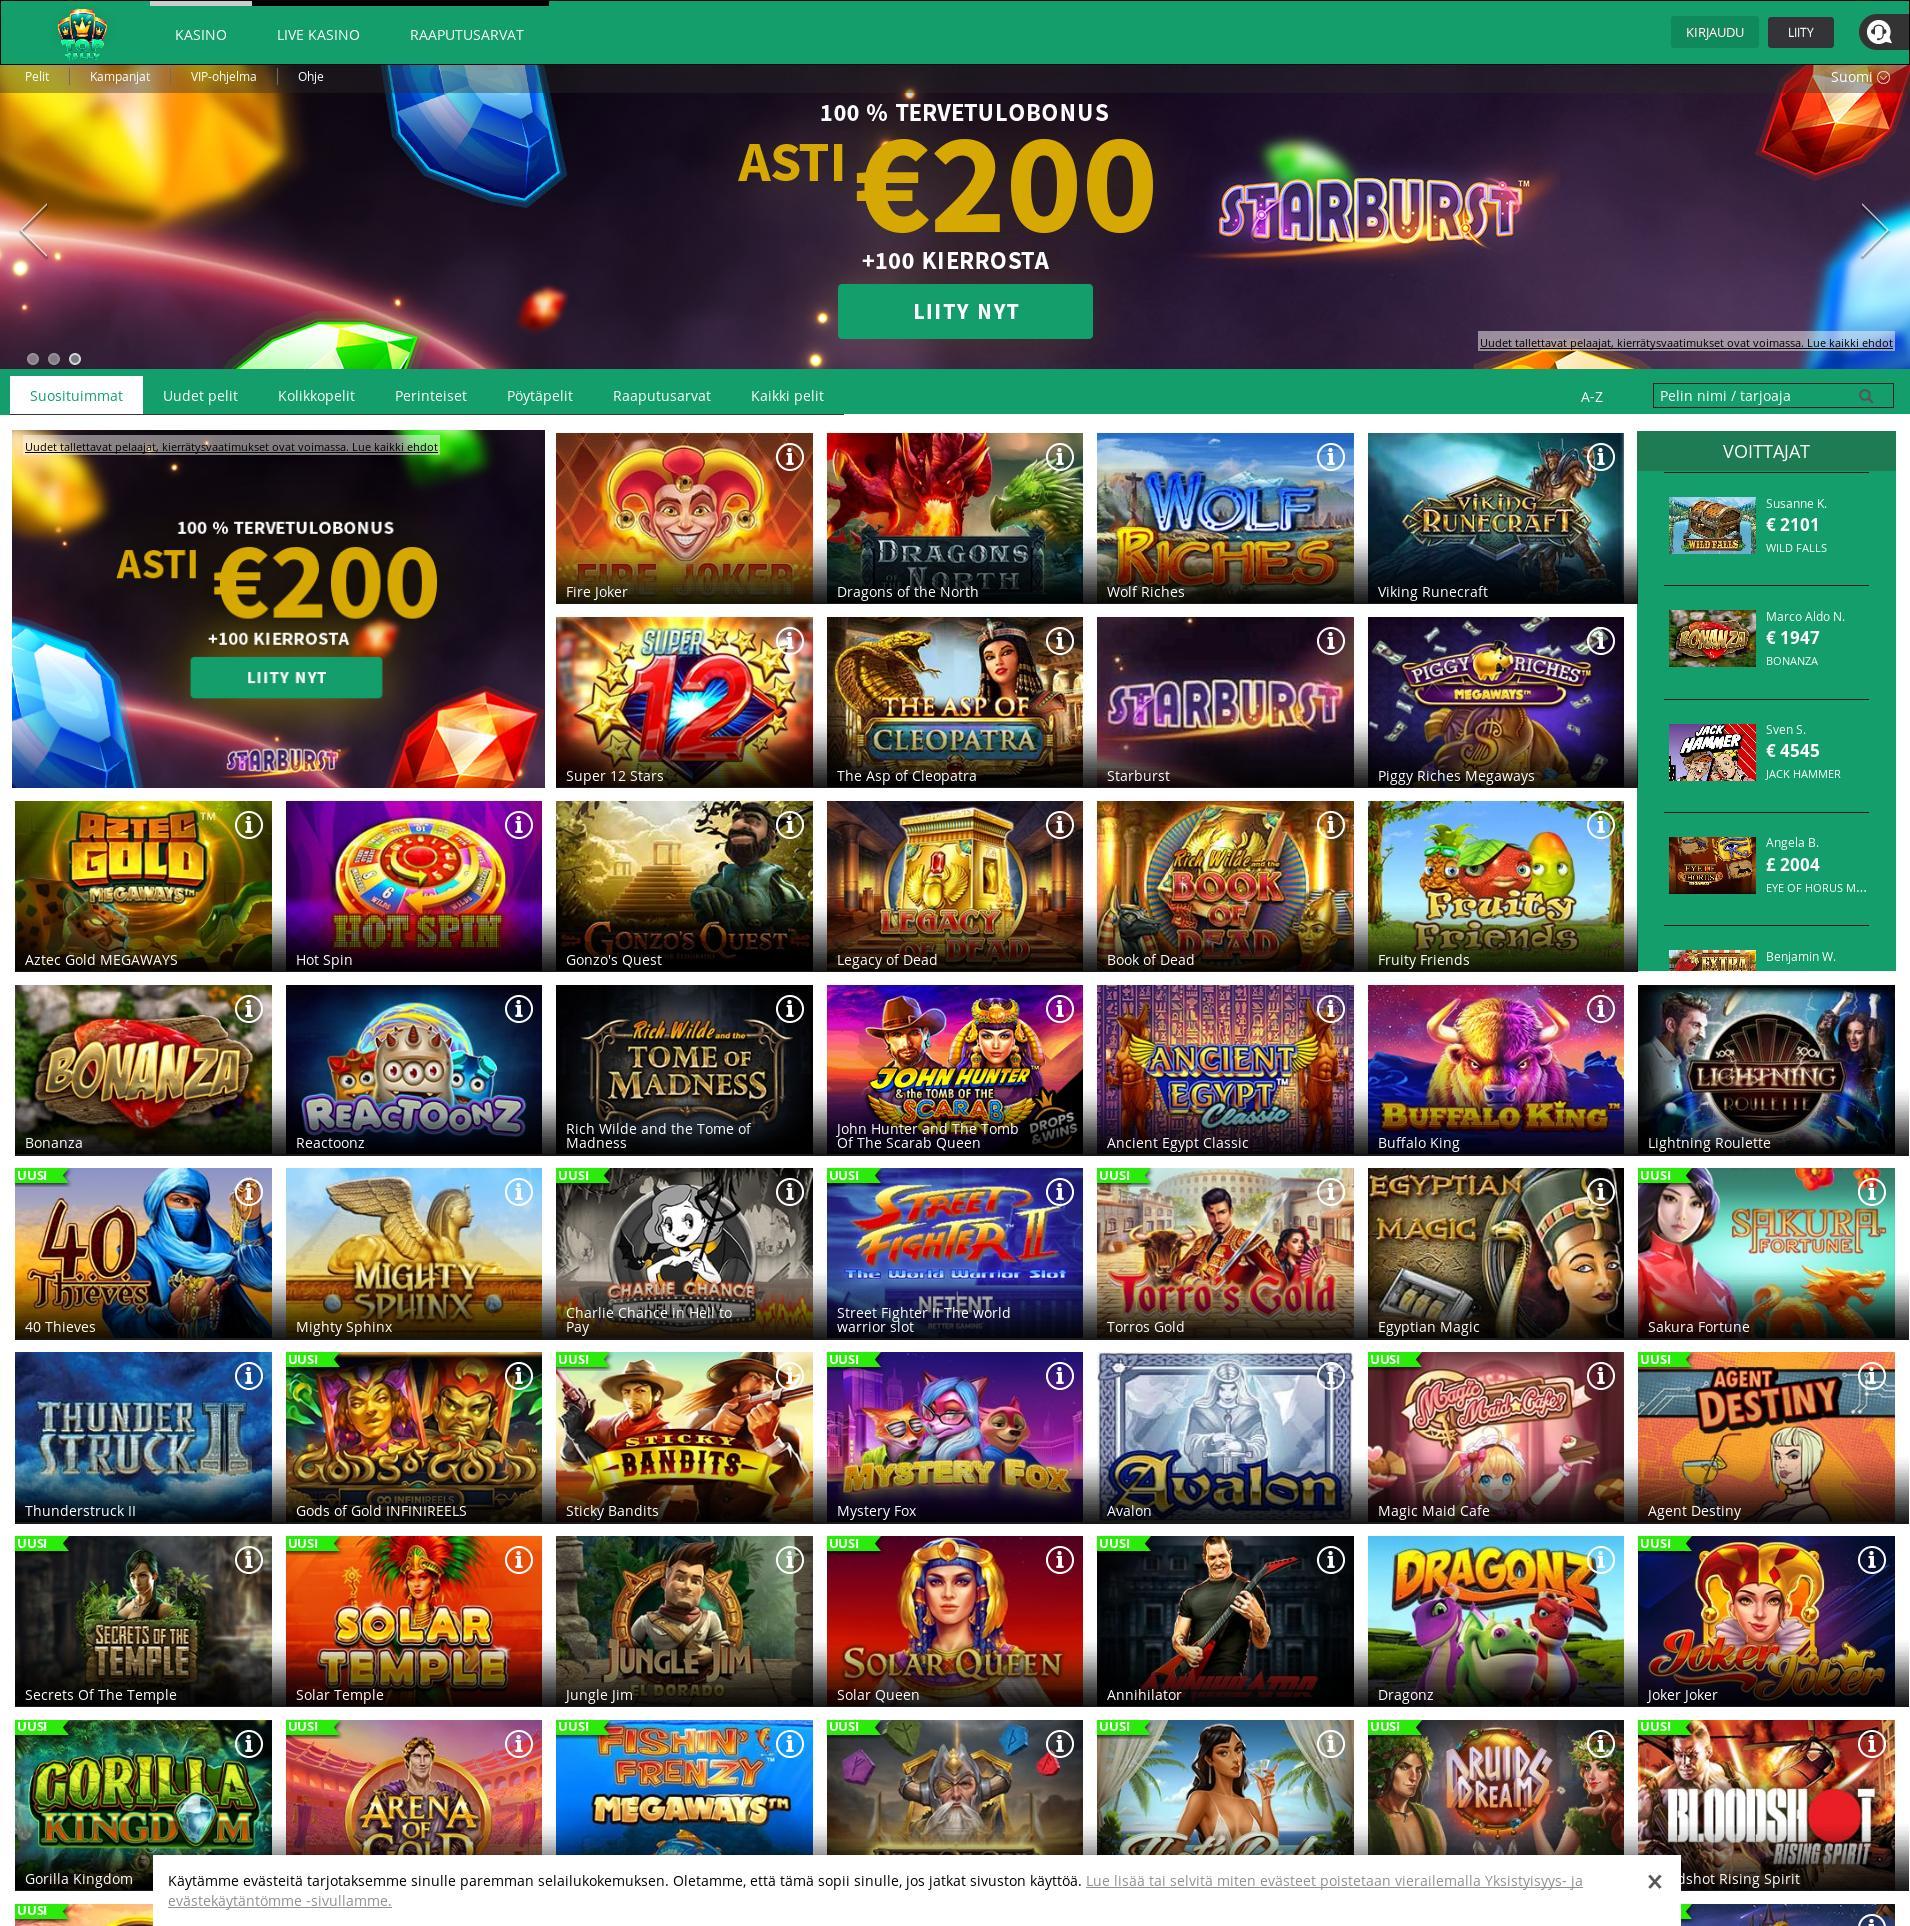 Casino screen Lobby 2020-05-28 for Finland